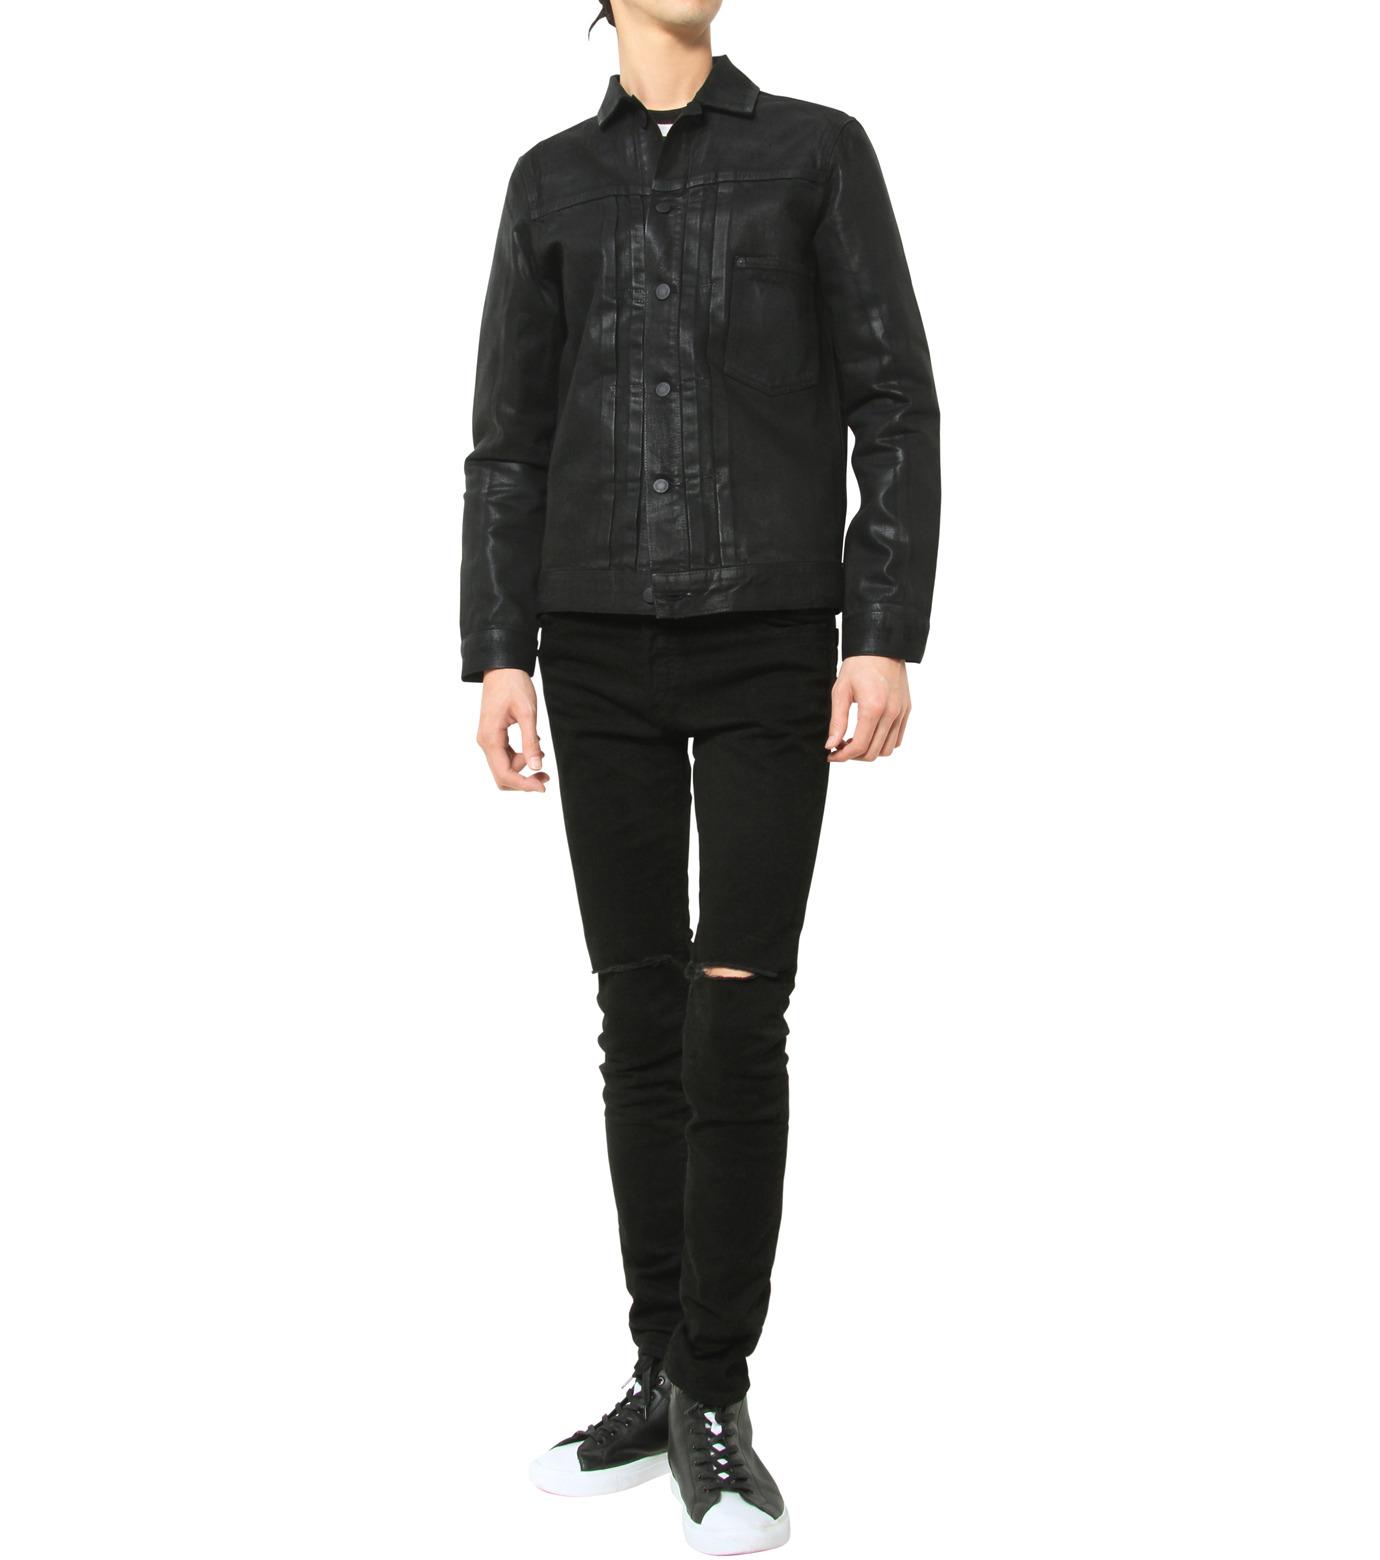 HL HEDDIE LOVU(エイチエル・エディールーヴ)のCOATING BLACK DENIM JACKET-BLACK(ジャケット/jacket)-17A94001-13 拡大詳細画像8